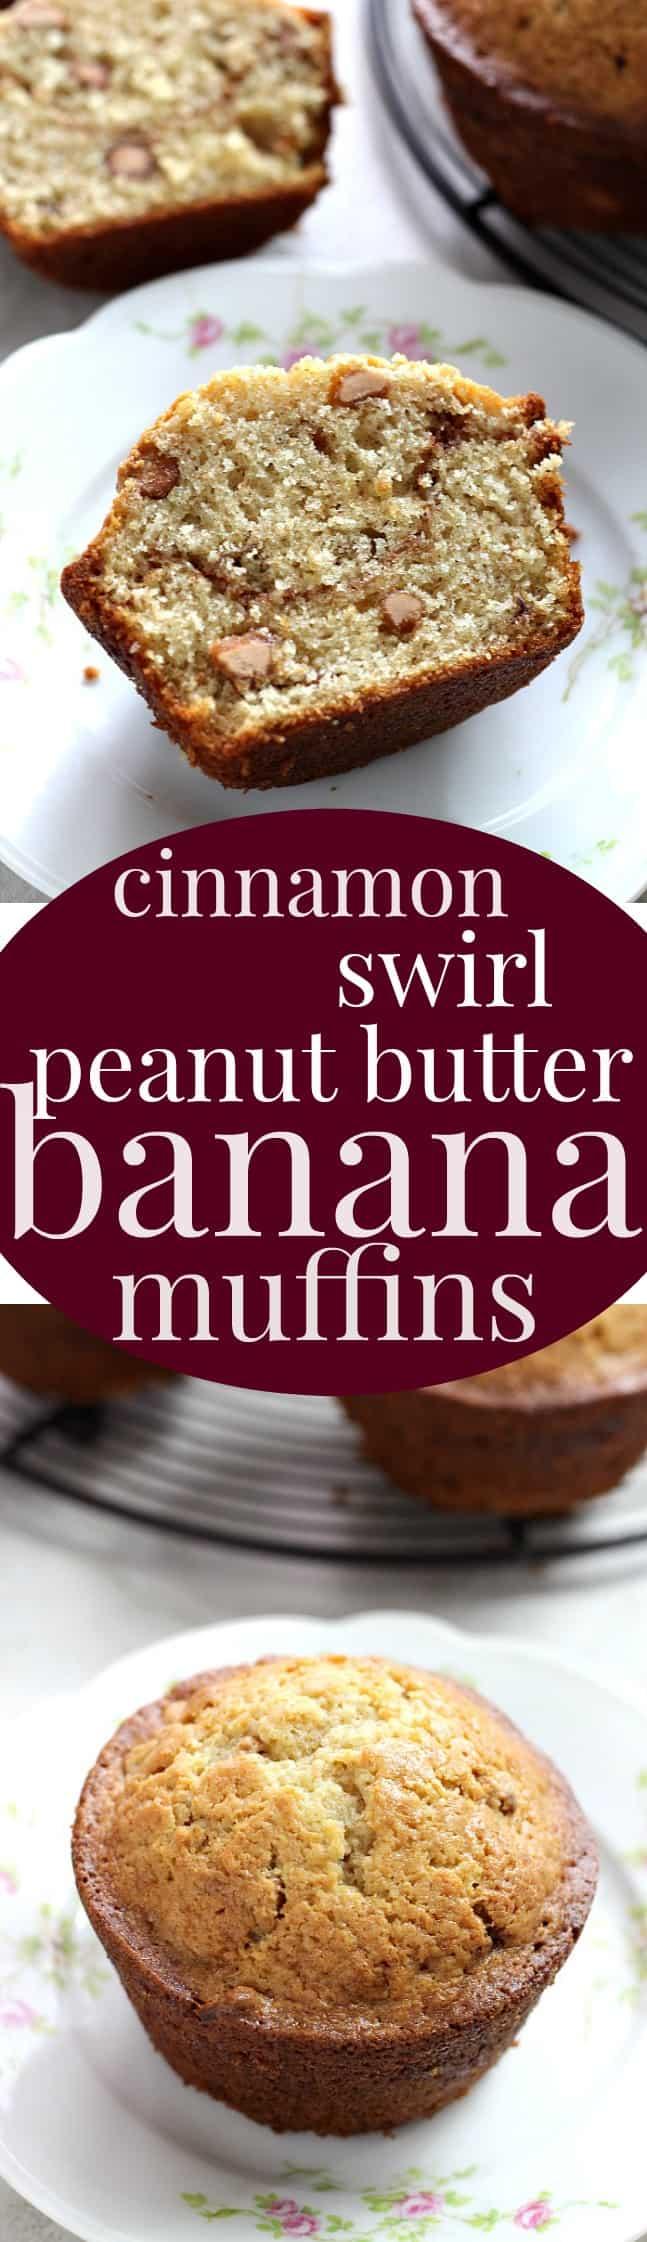 cinnamon swirl peanut butter banana muffins long Cinnamon Swirl Peanut Butter Banana Muffins + Video!